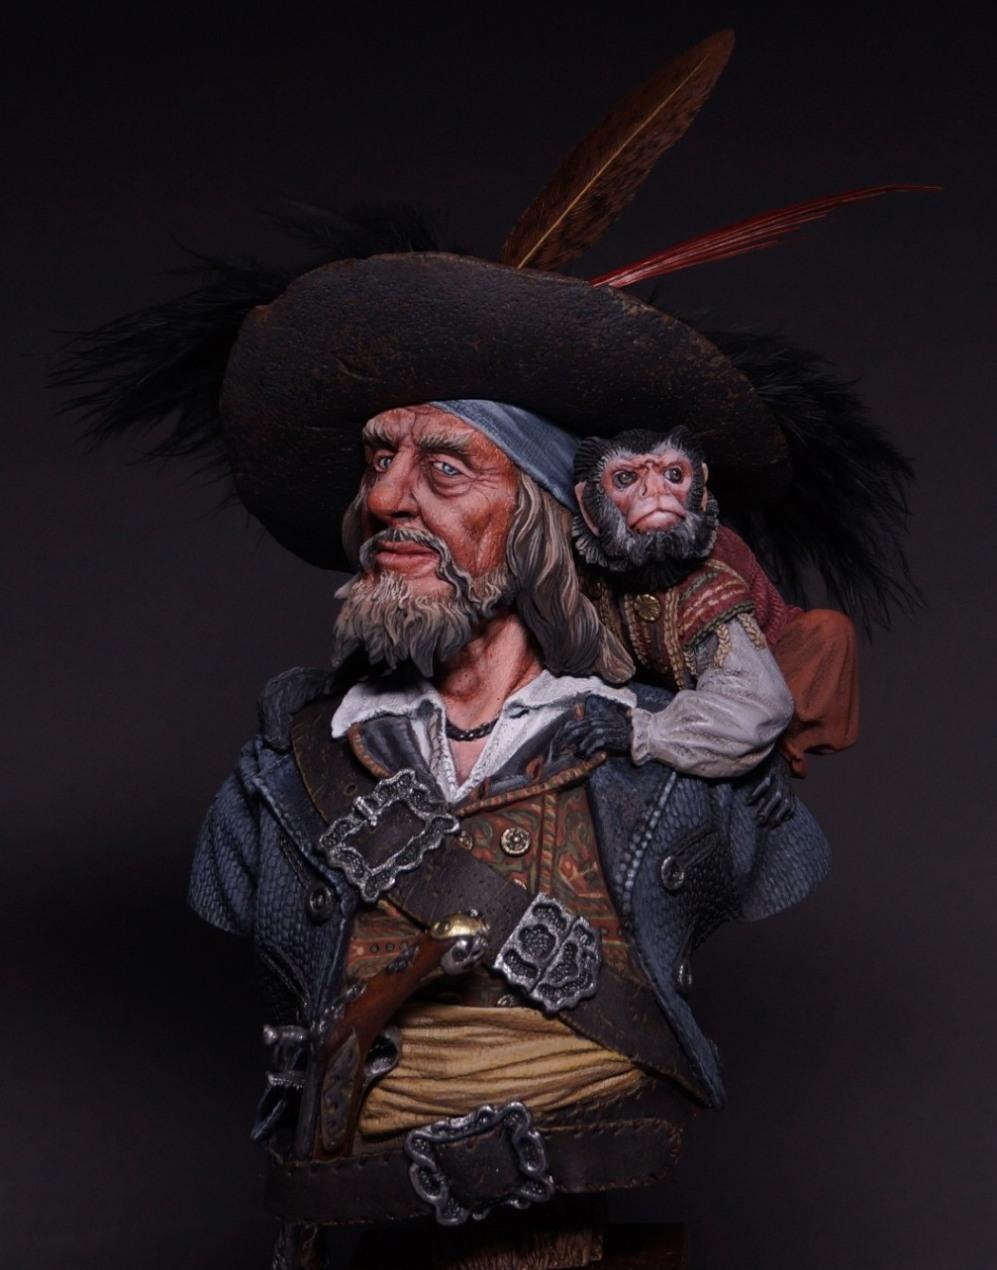 Figures: Captain Barbossa, photo #1